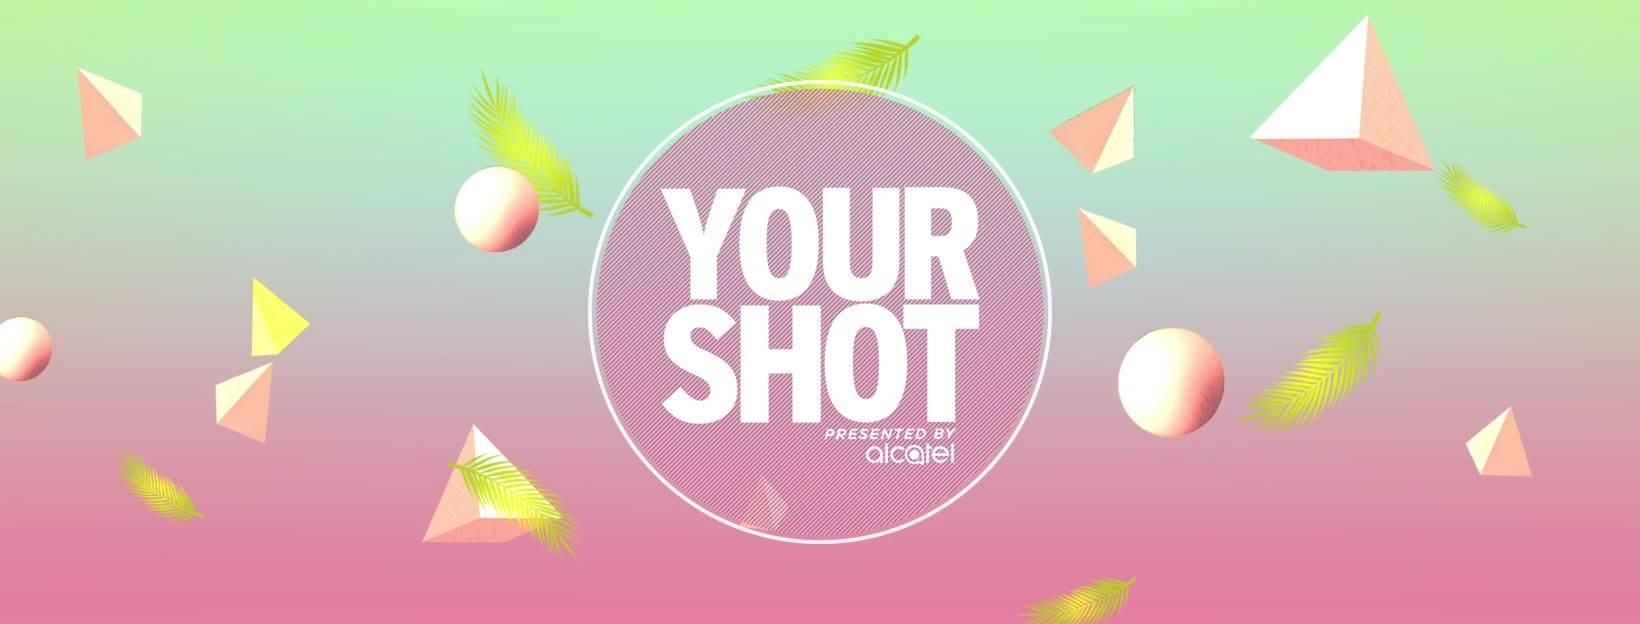 YourShot